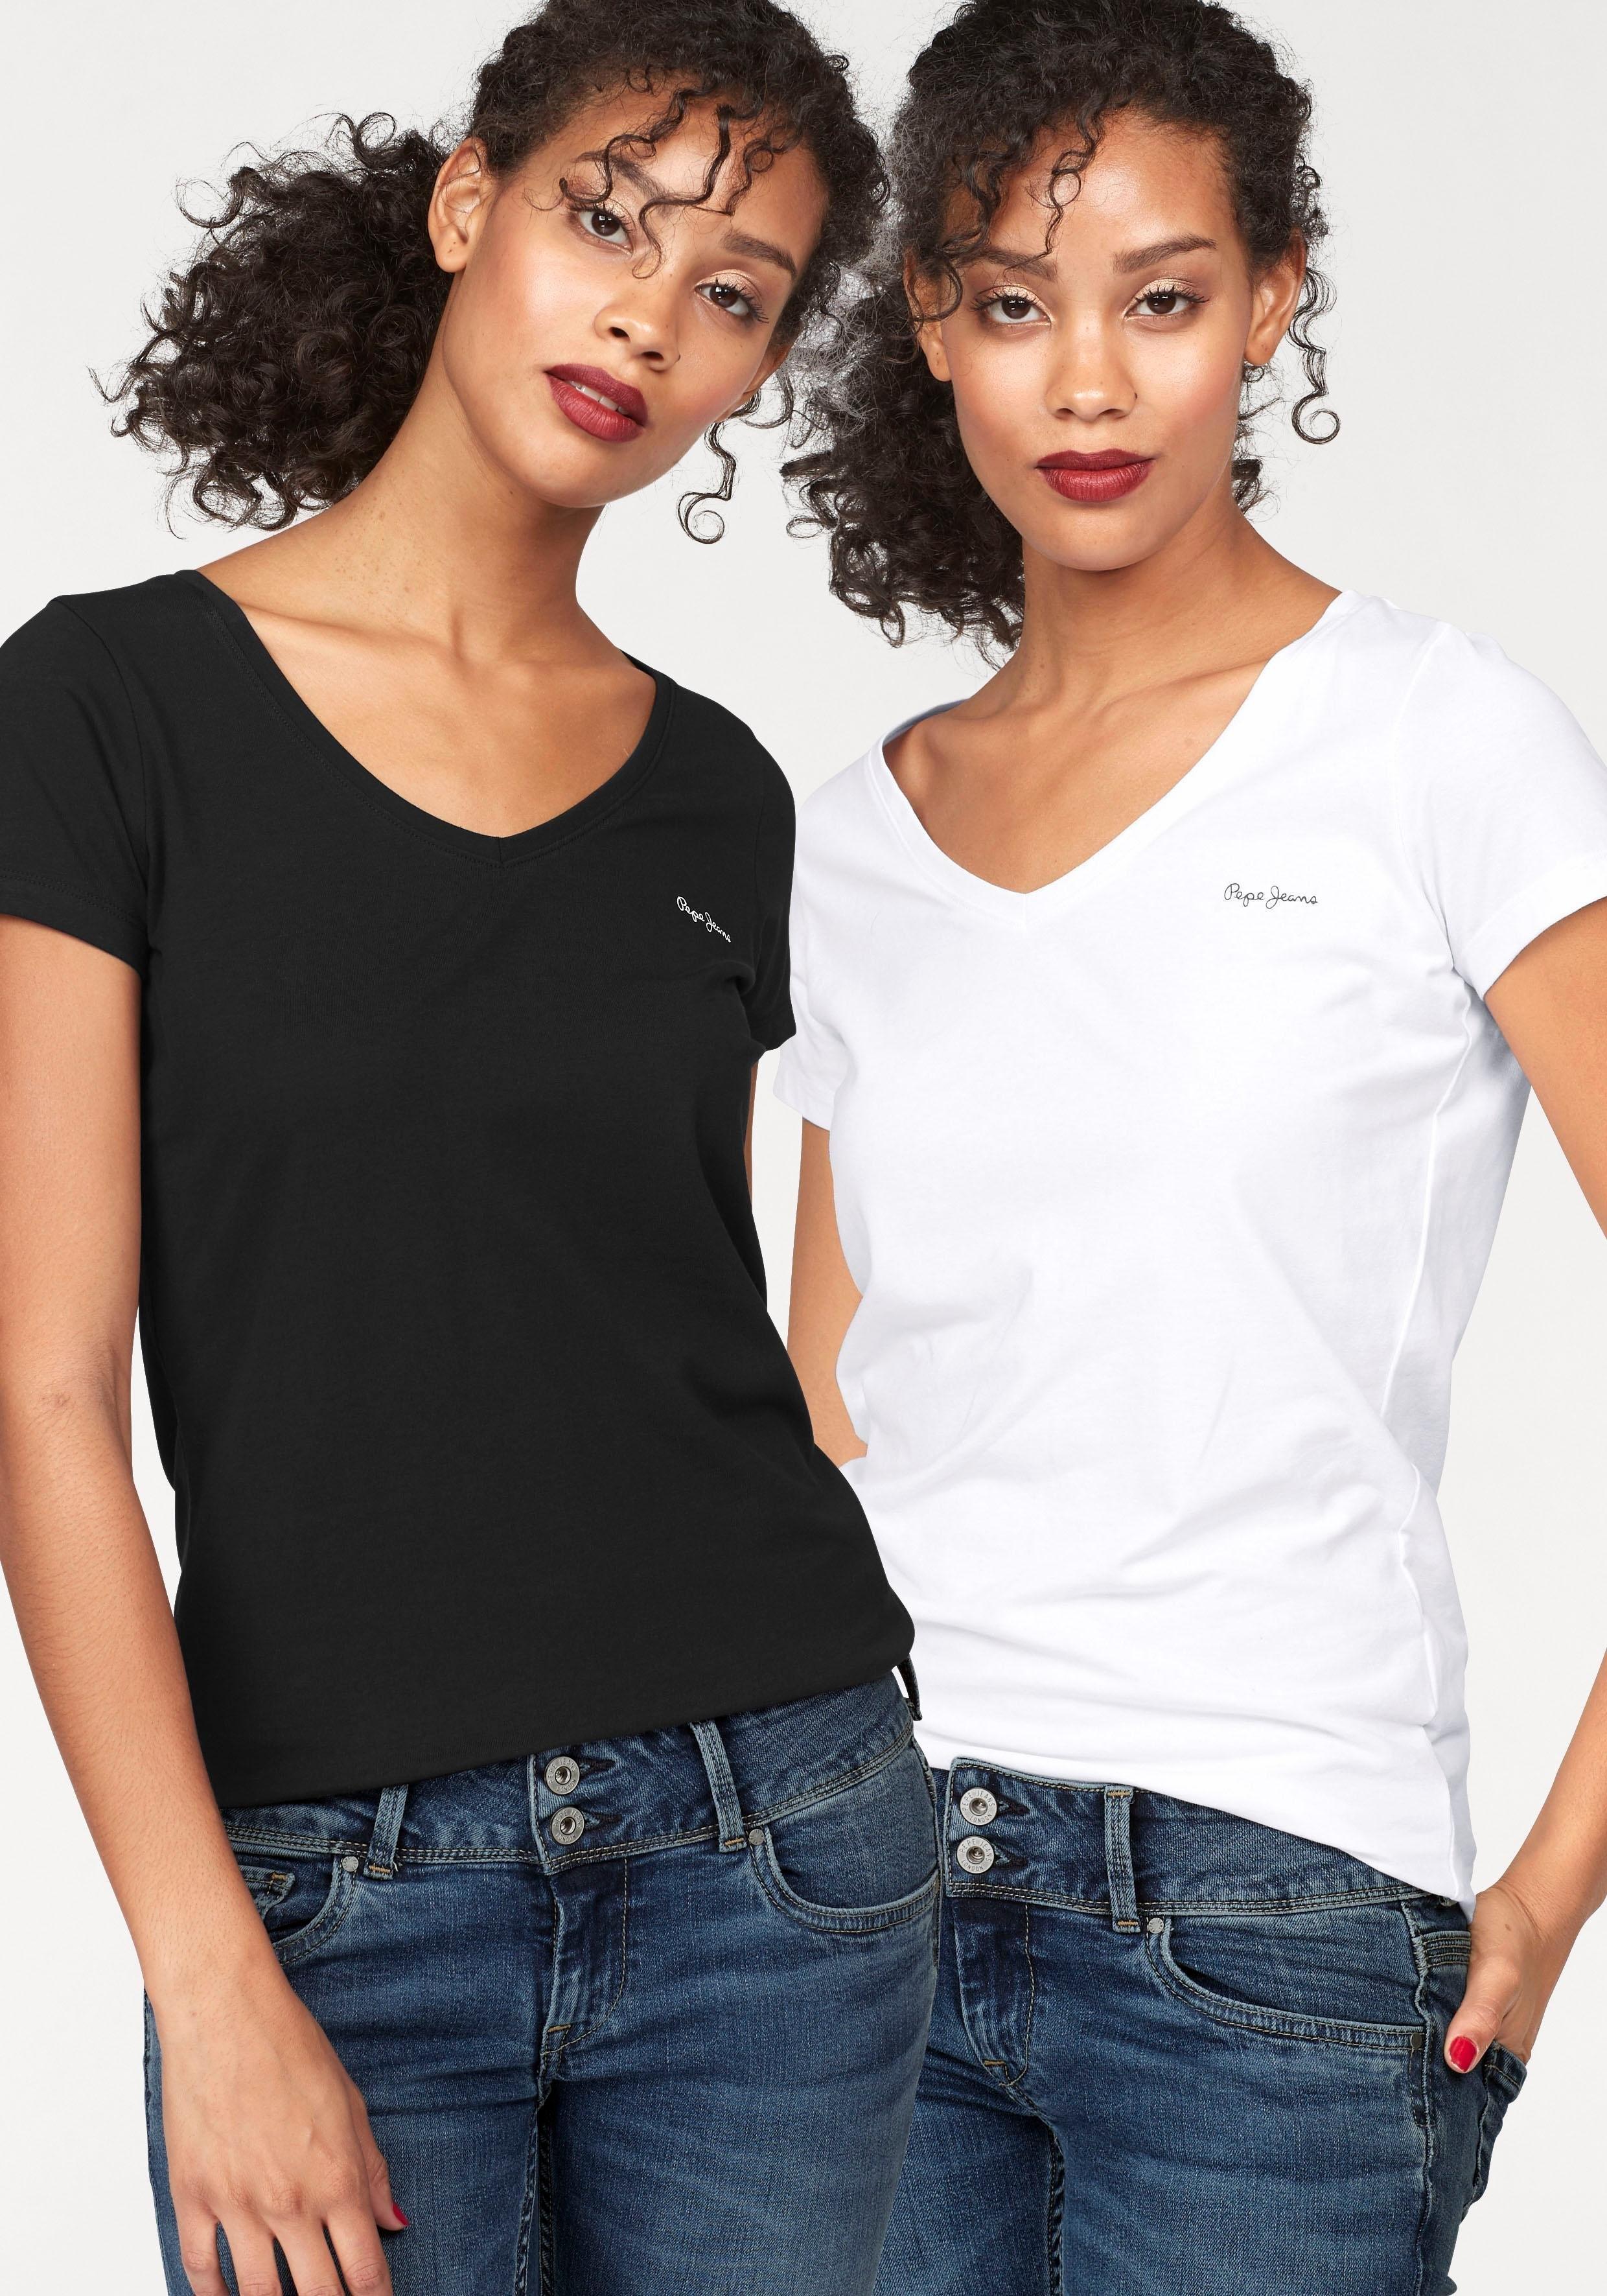 498906efe3 Pepe Jeans T-shirt »LARA« (set van 2) online verkrijgbaar